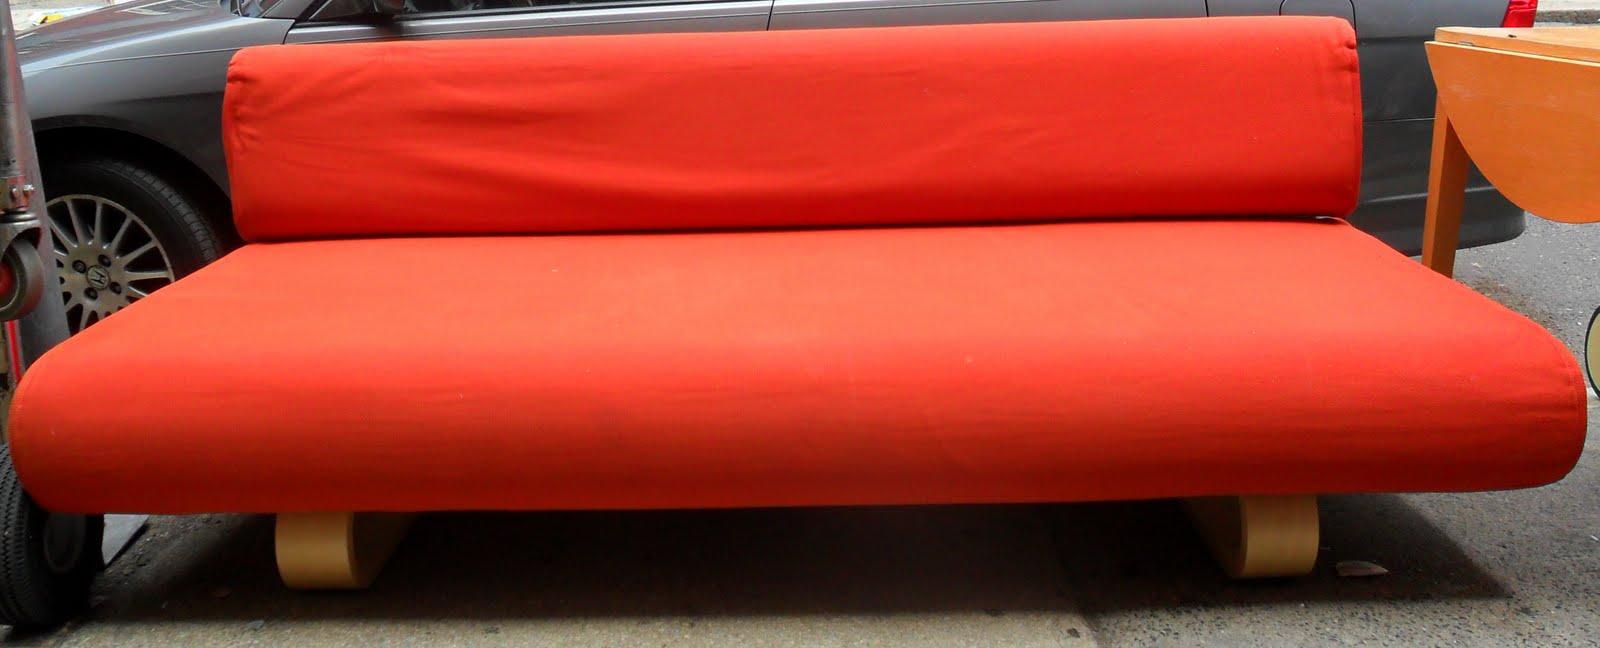 Uhuru Furniture Collectibles IKEA Orange Couch SOLD